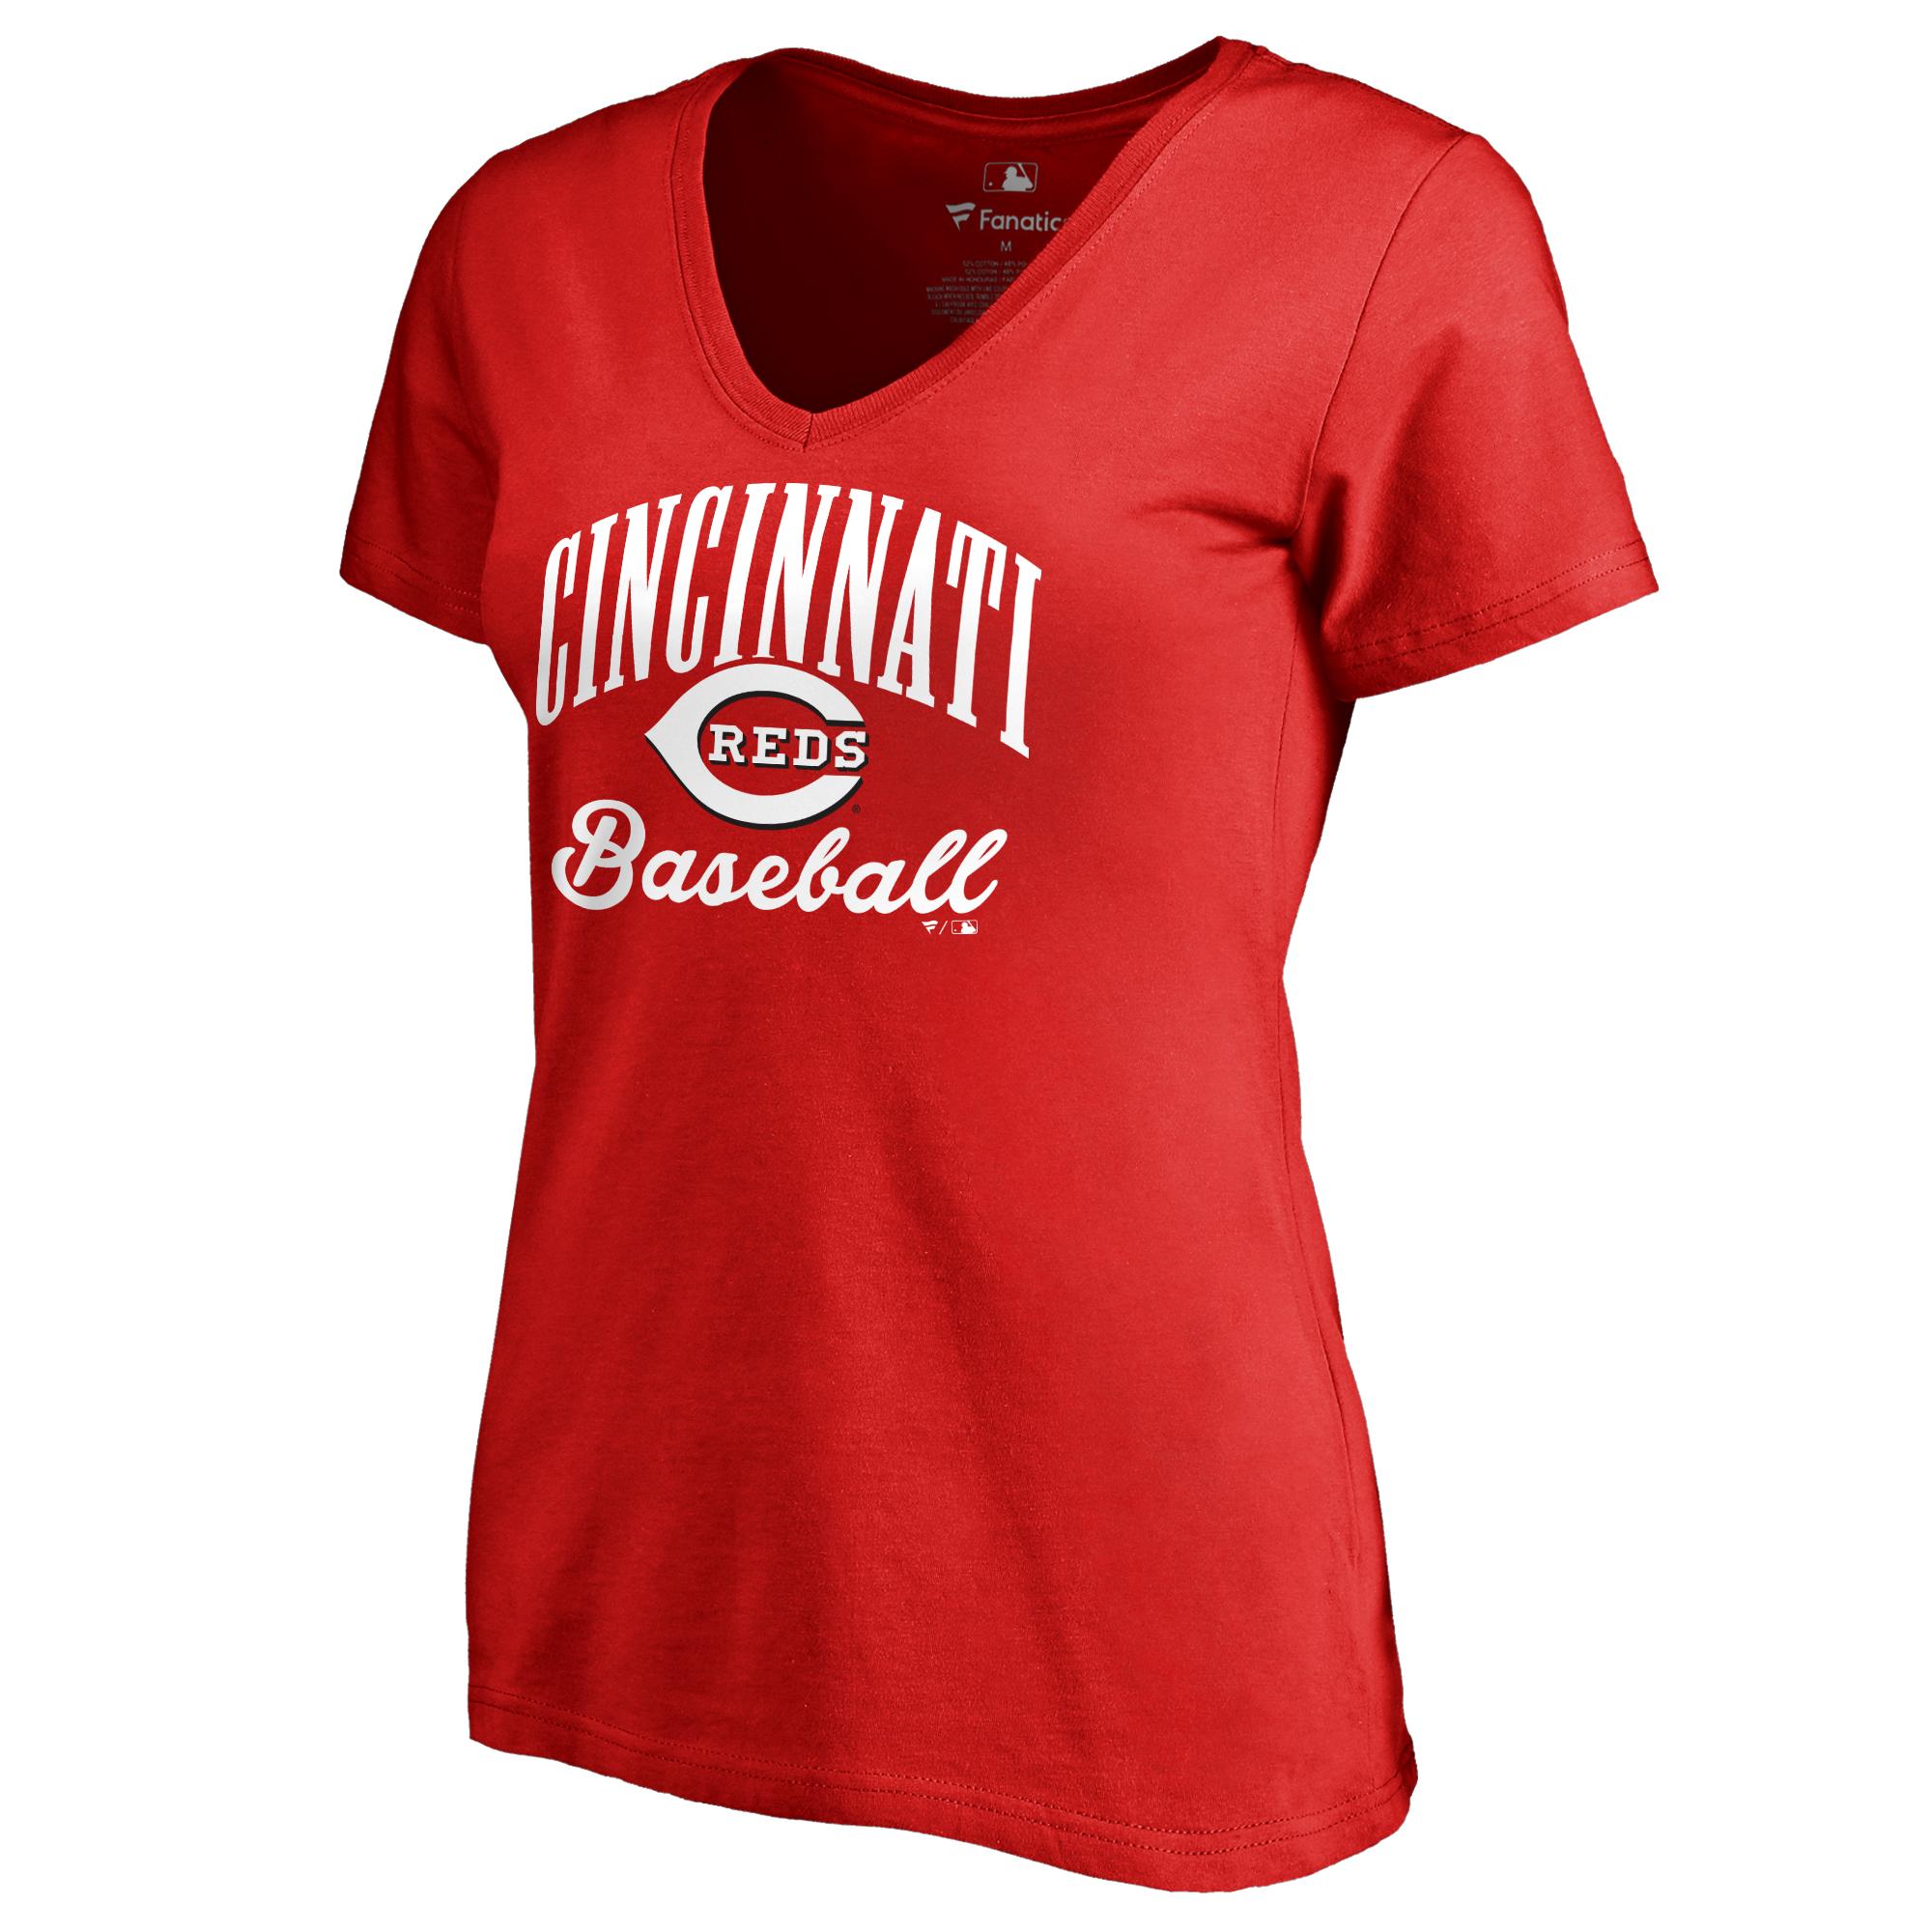 Cincinnati Reds Women's Victory Script T-Shirt - Red